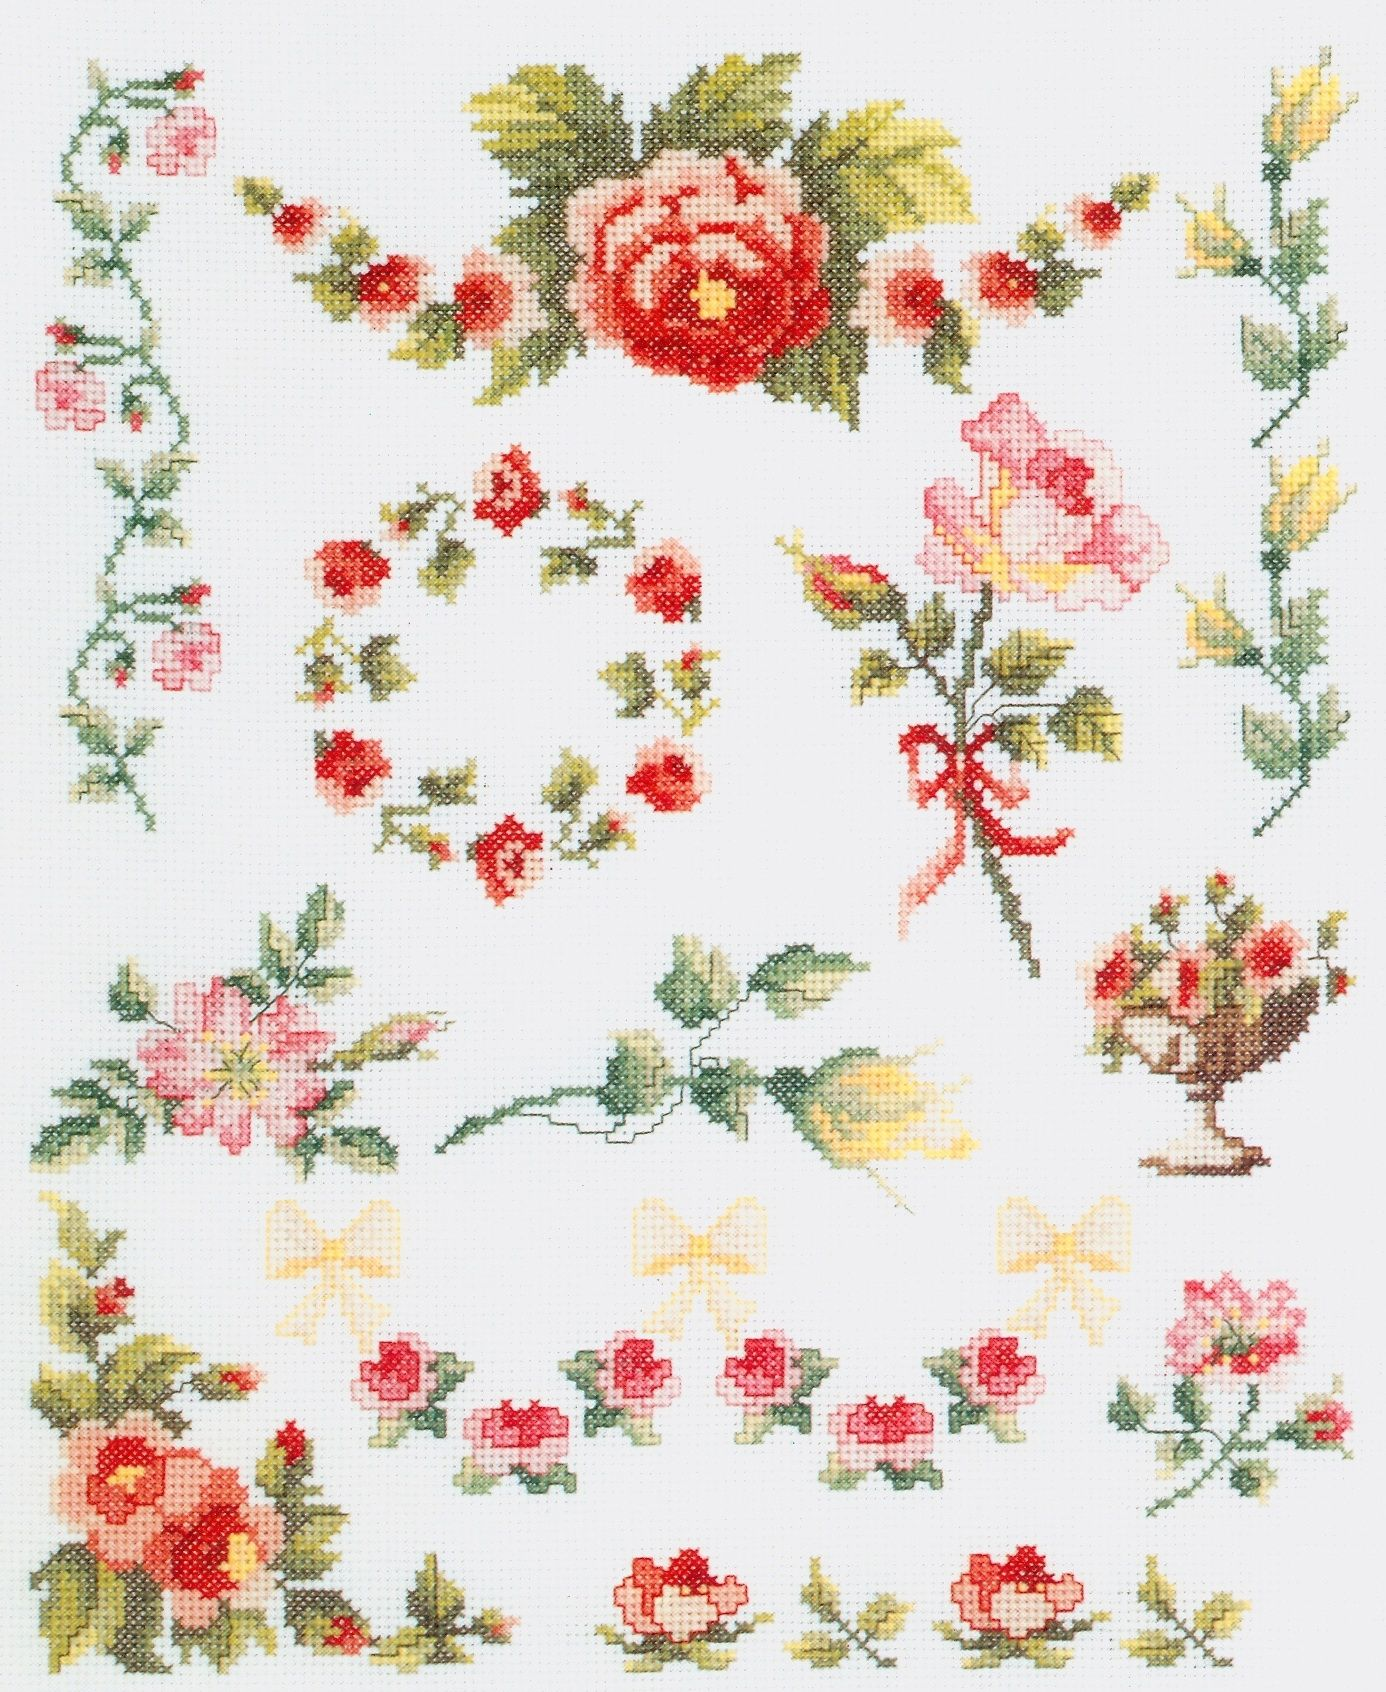 Rose Sampler free cross stitch pattern from www.coatscraft.pl ...